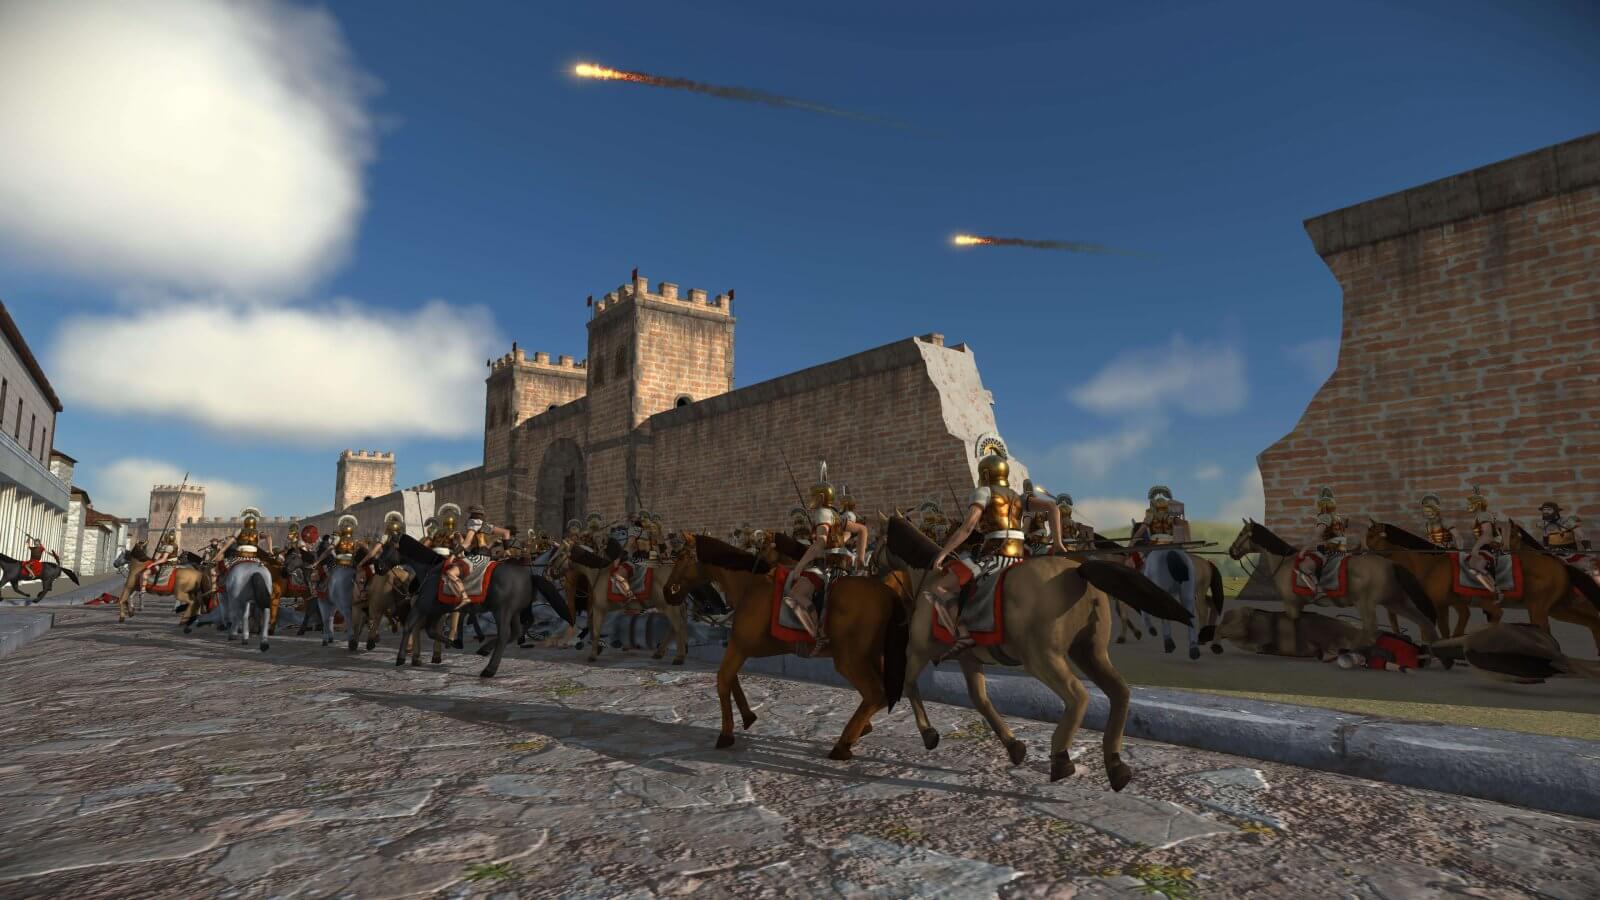 Image Source: Total War